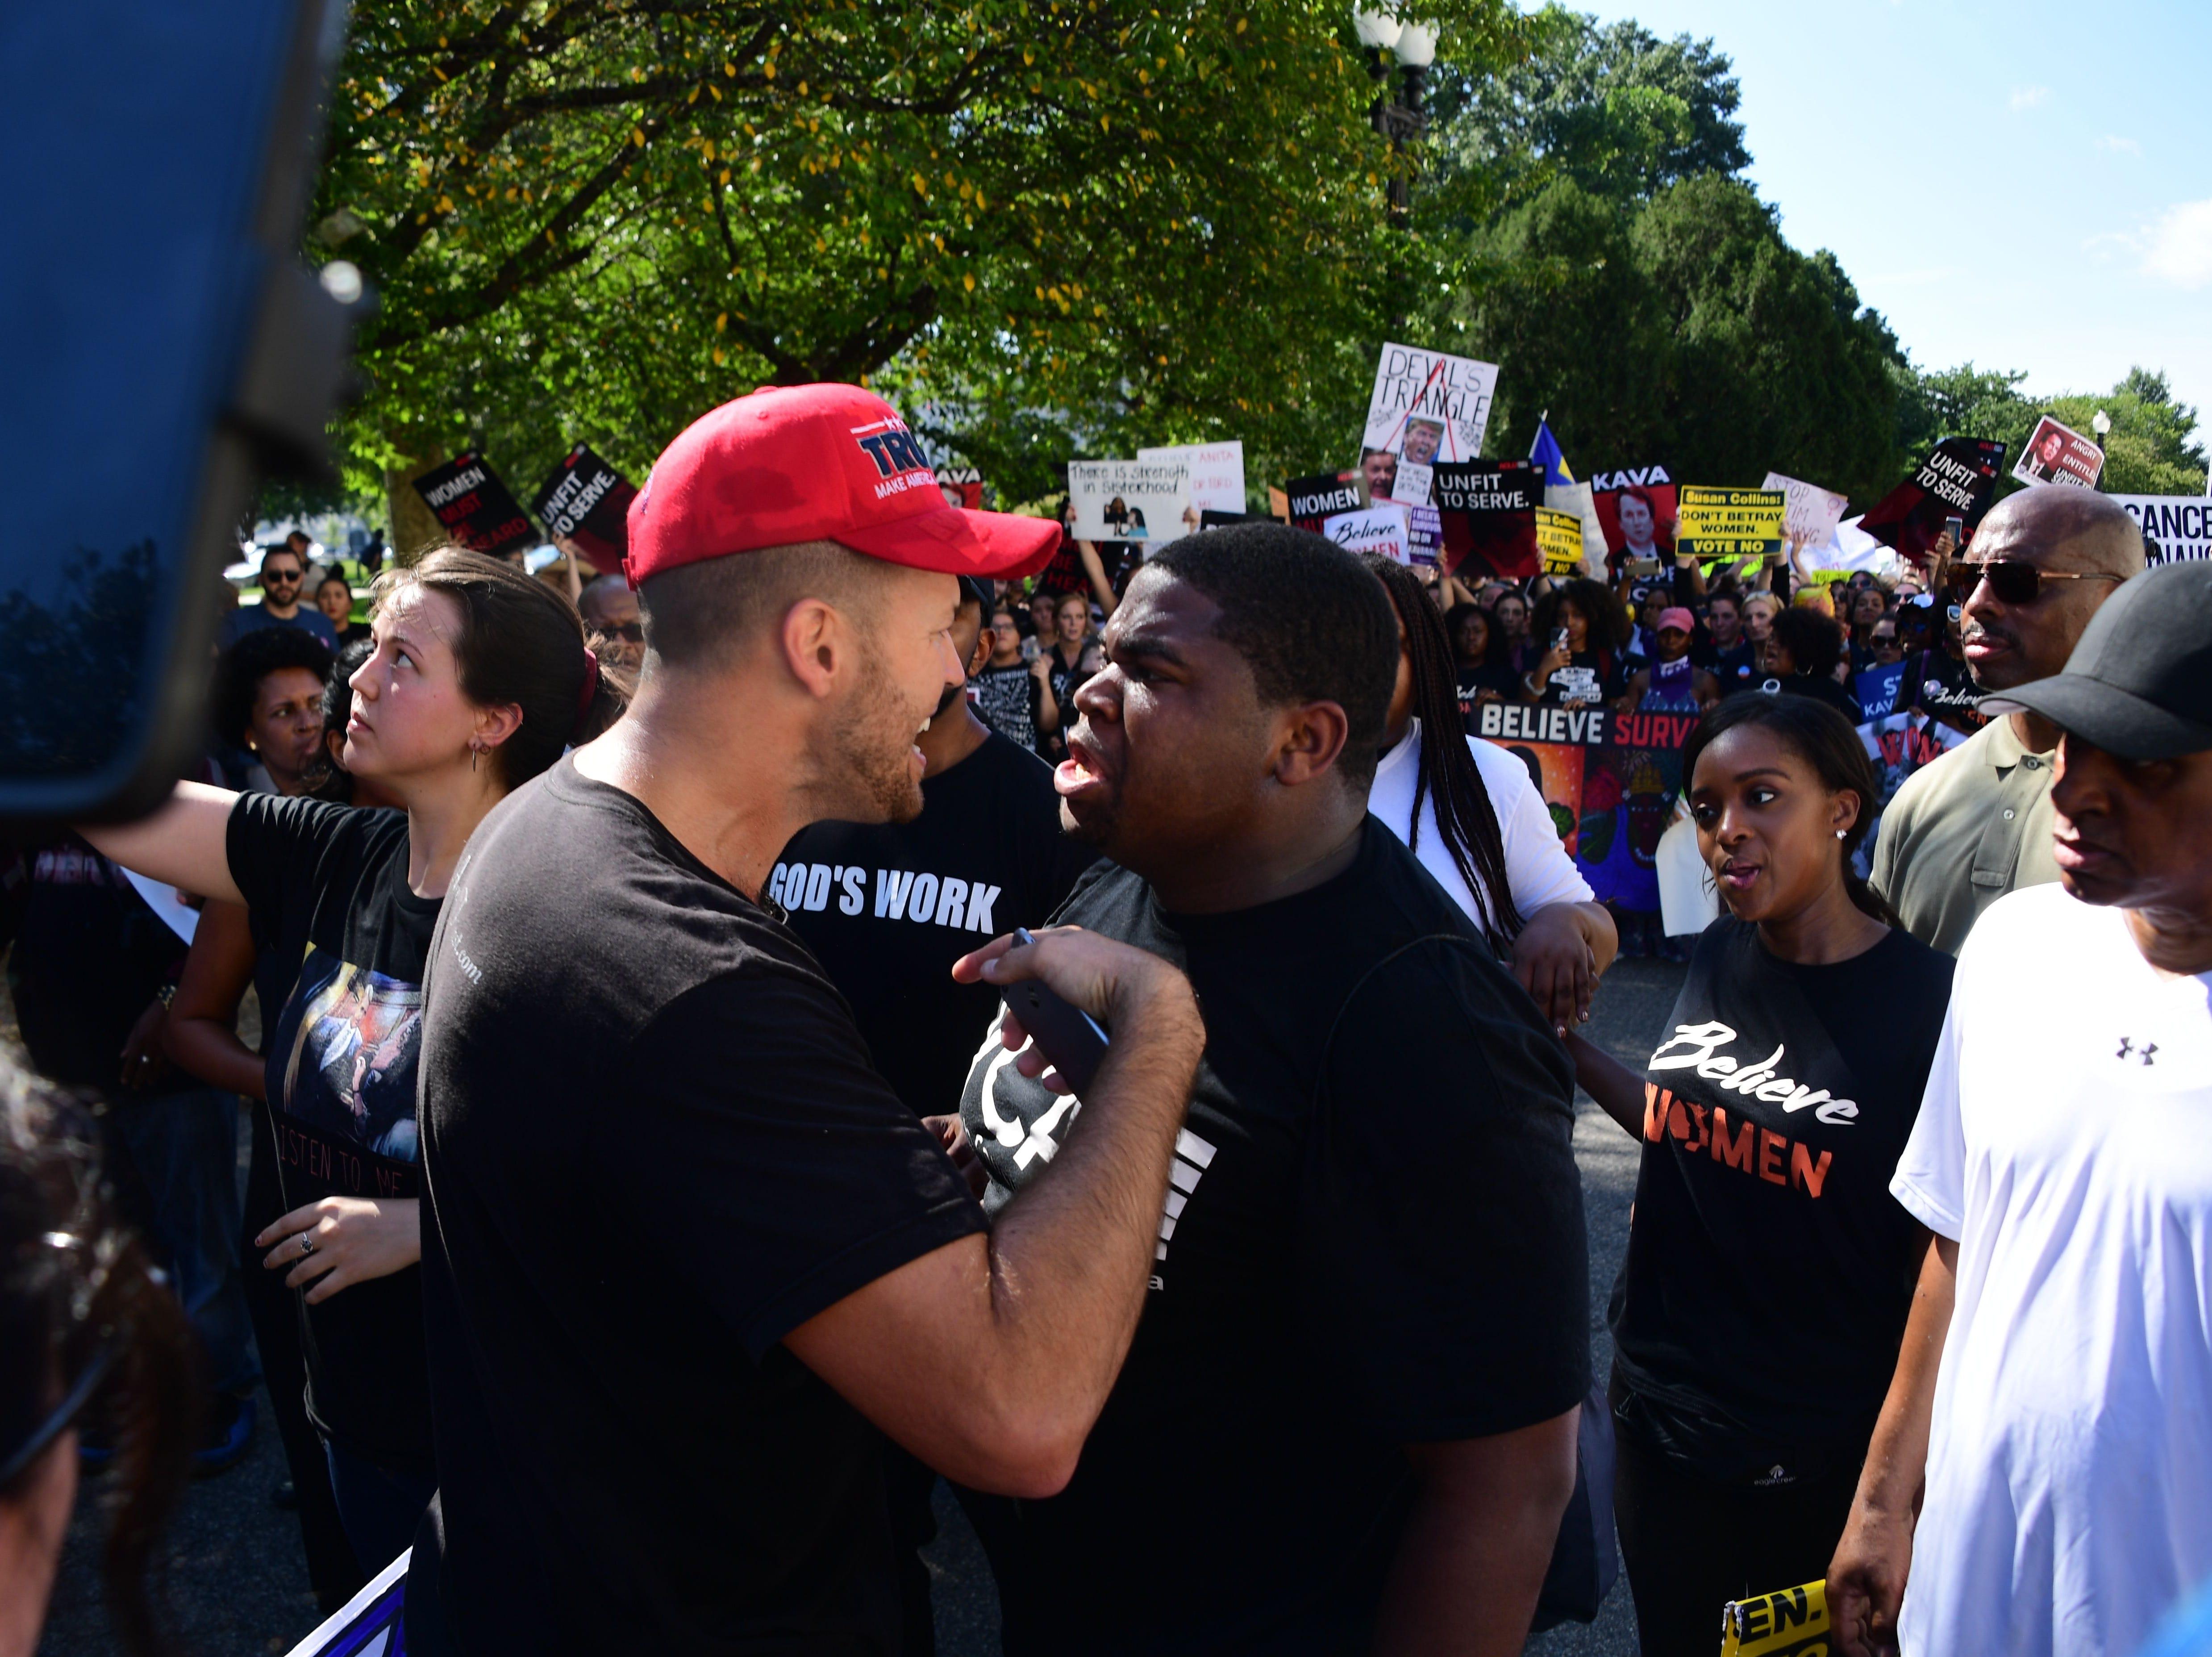 Demonstrators protest U.S. Supreme Court nominee Brett Kavanaugh near the Capitol on Oct. 4, 2018, in Washington, D.C.